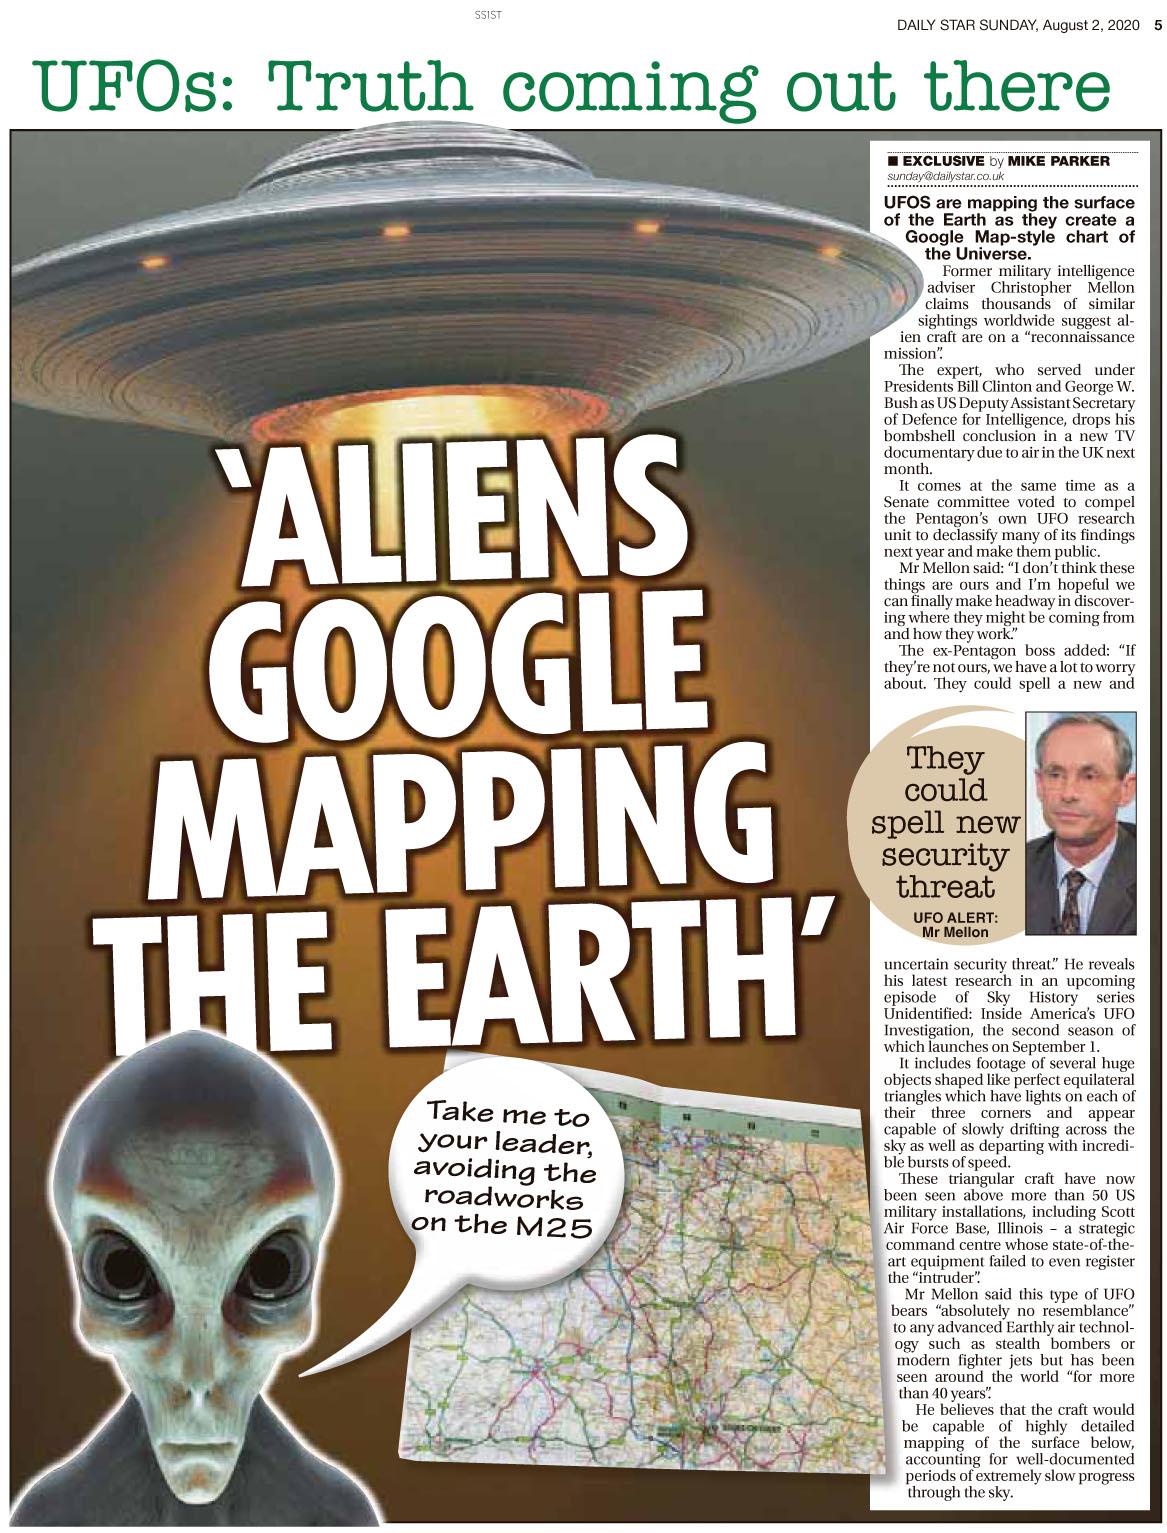 Daily Star 2020-08-02 UFO.jpg